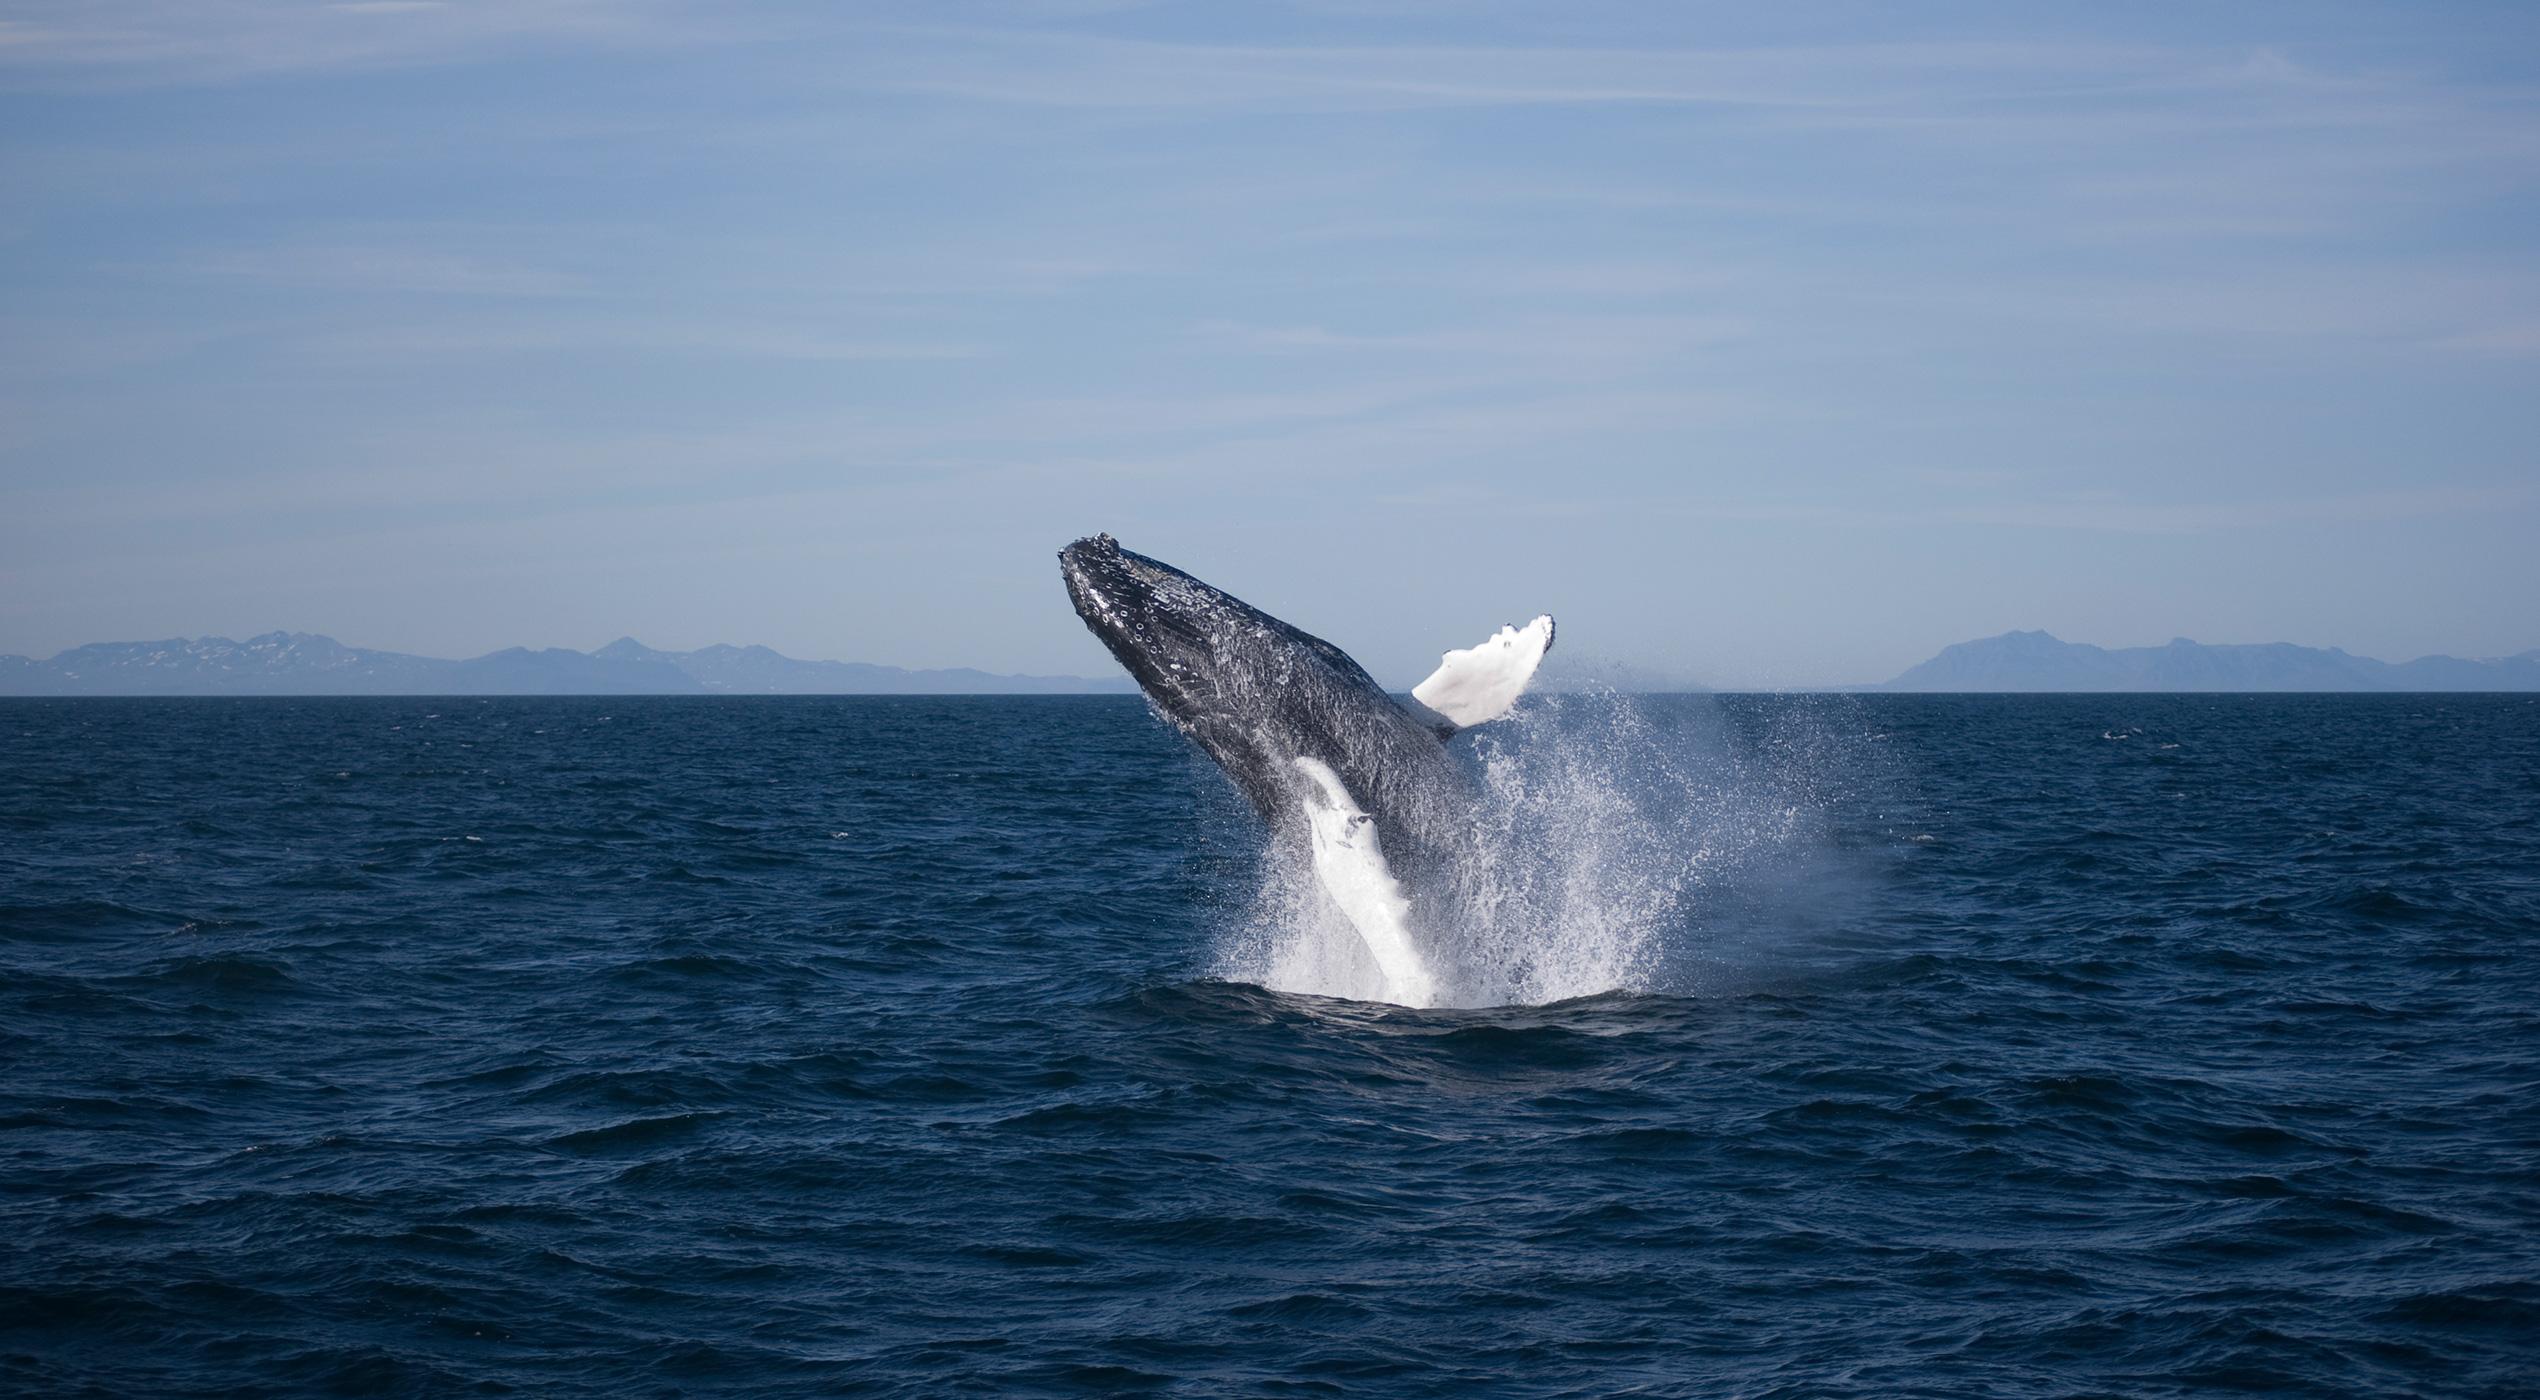 Whalewatching-umping-Humpback_Megan-.jpg